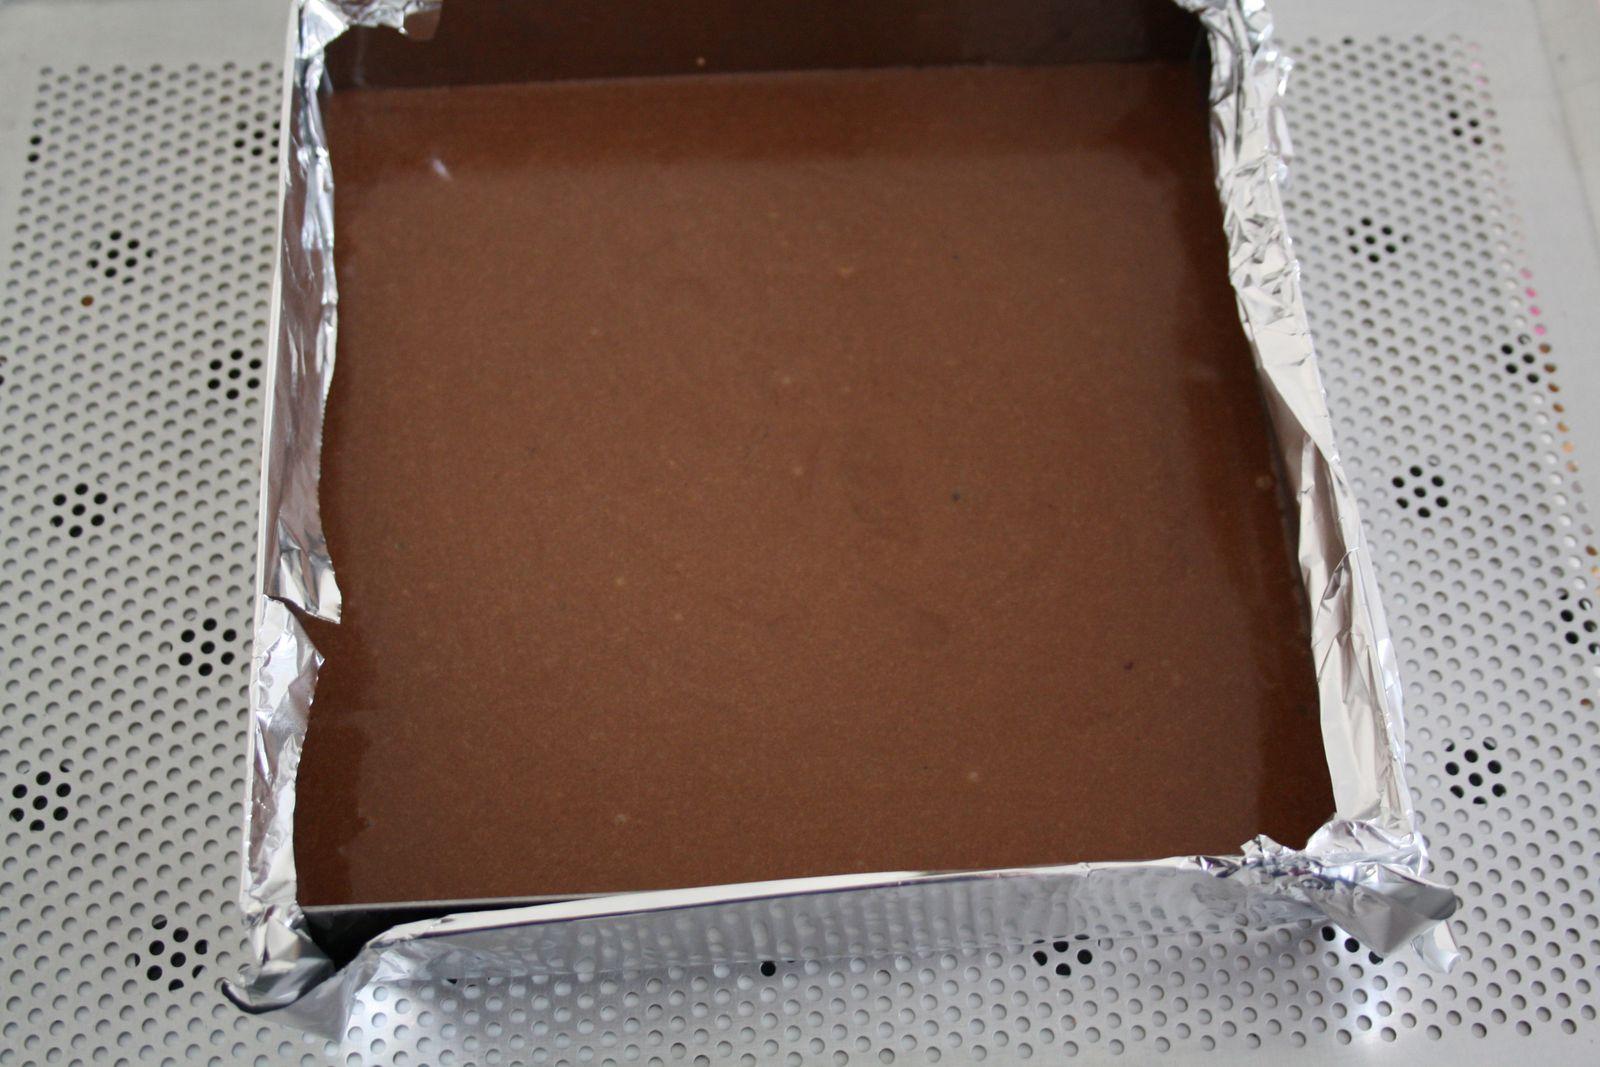 CAKE CHOCOLAT ET FRAMBOISE DE T. BAMAS